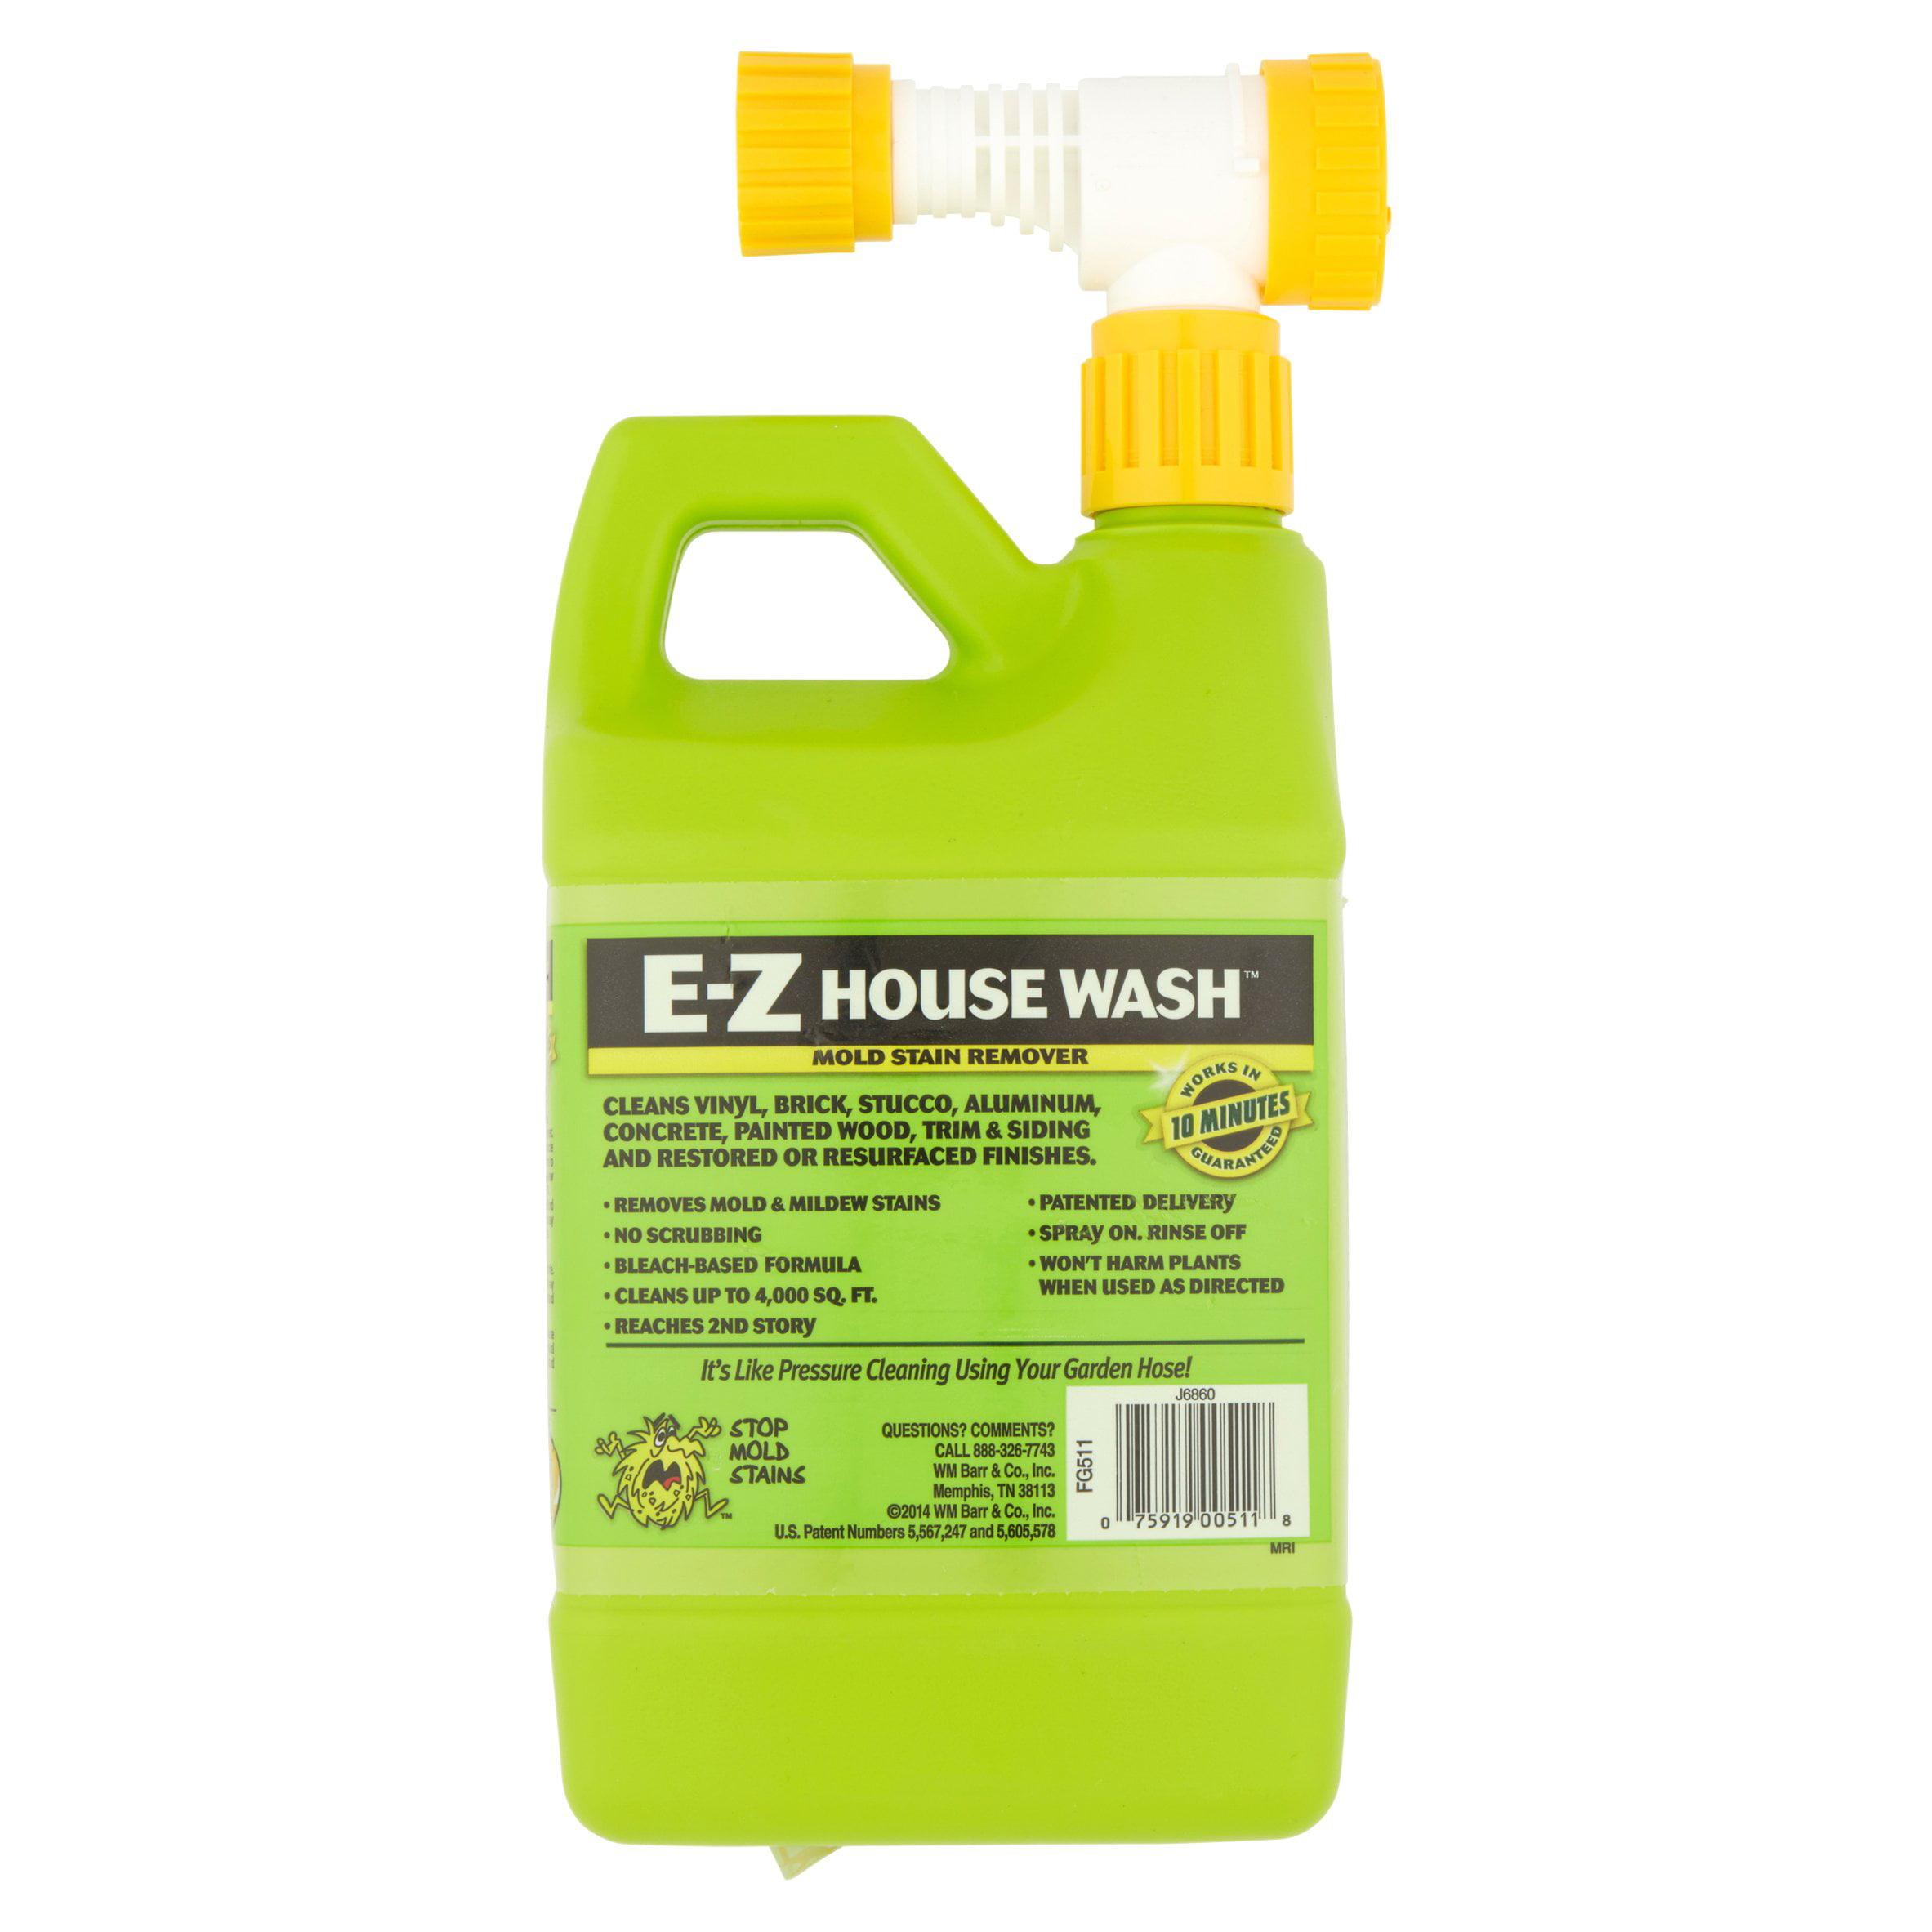 Home Armor E Z House Wash Mold Stain Remover 56 fl oz Walmart